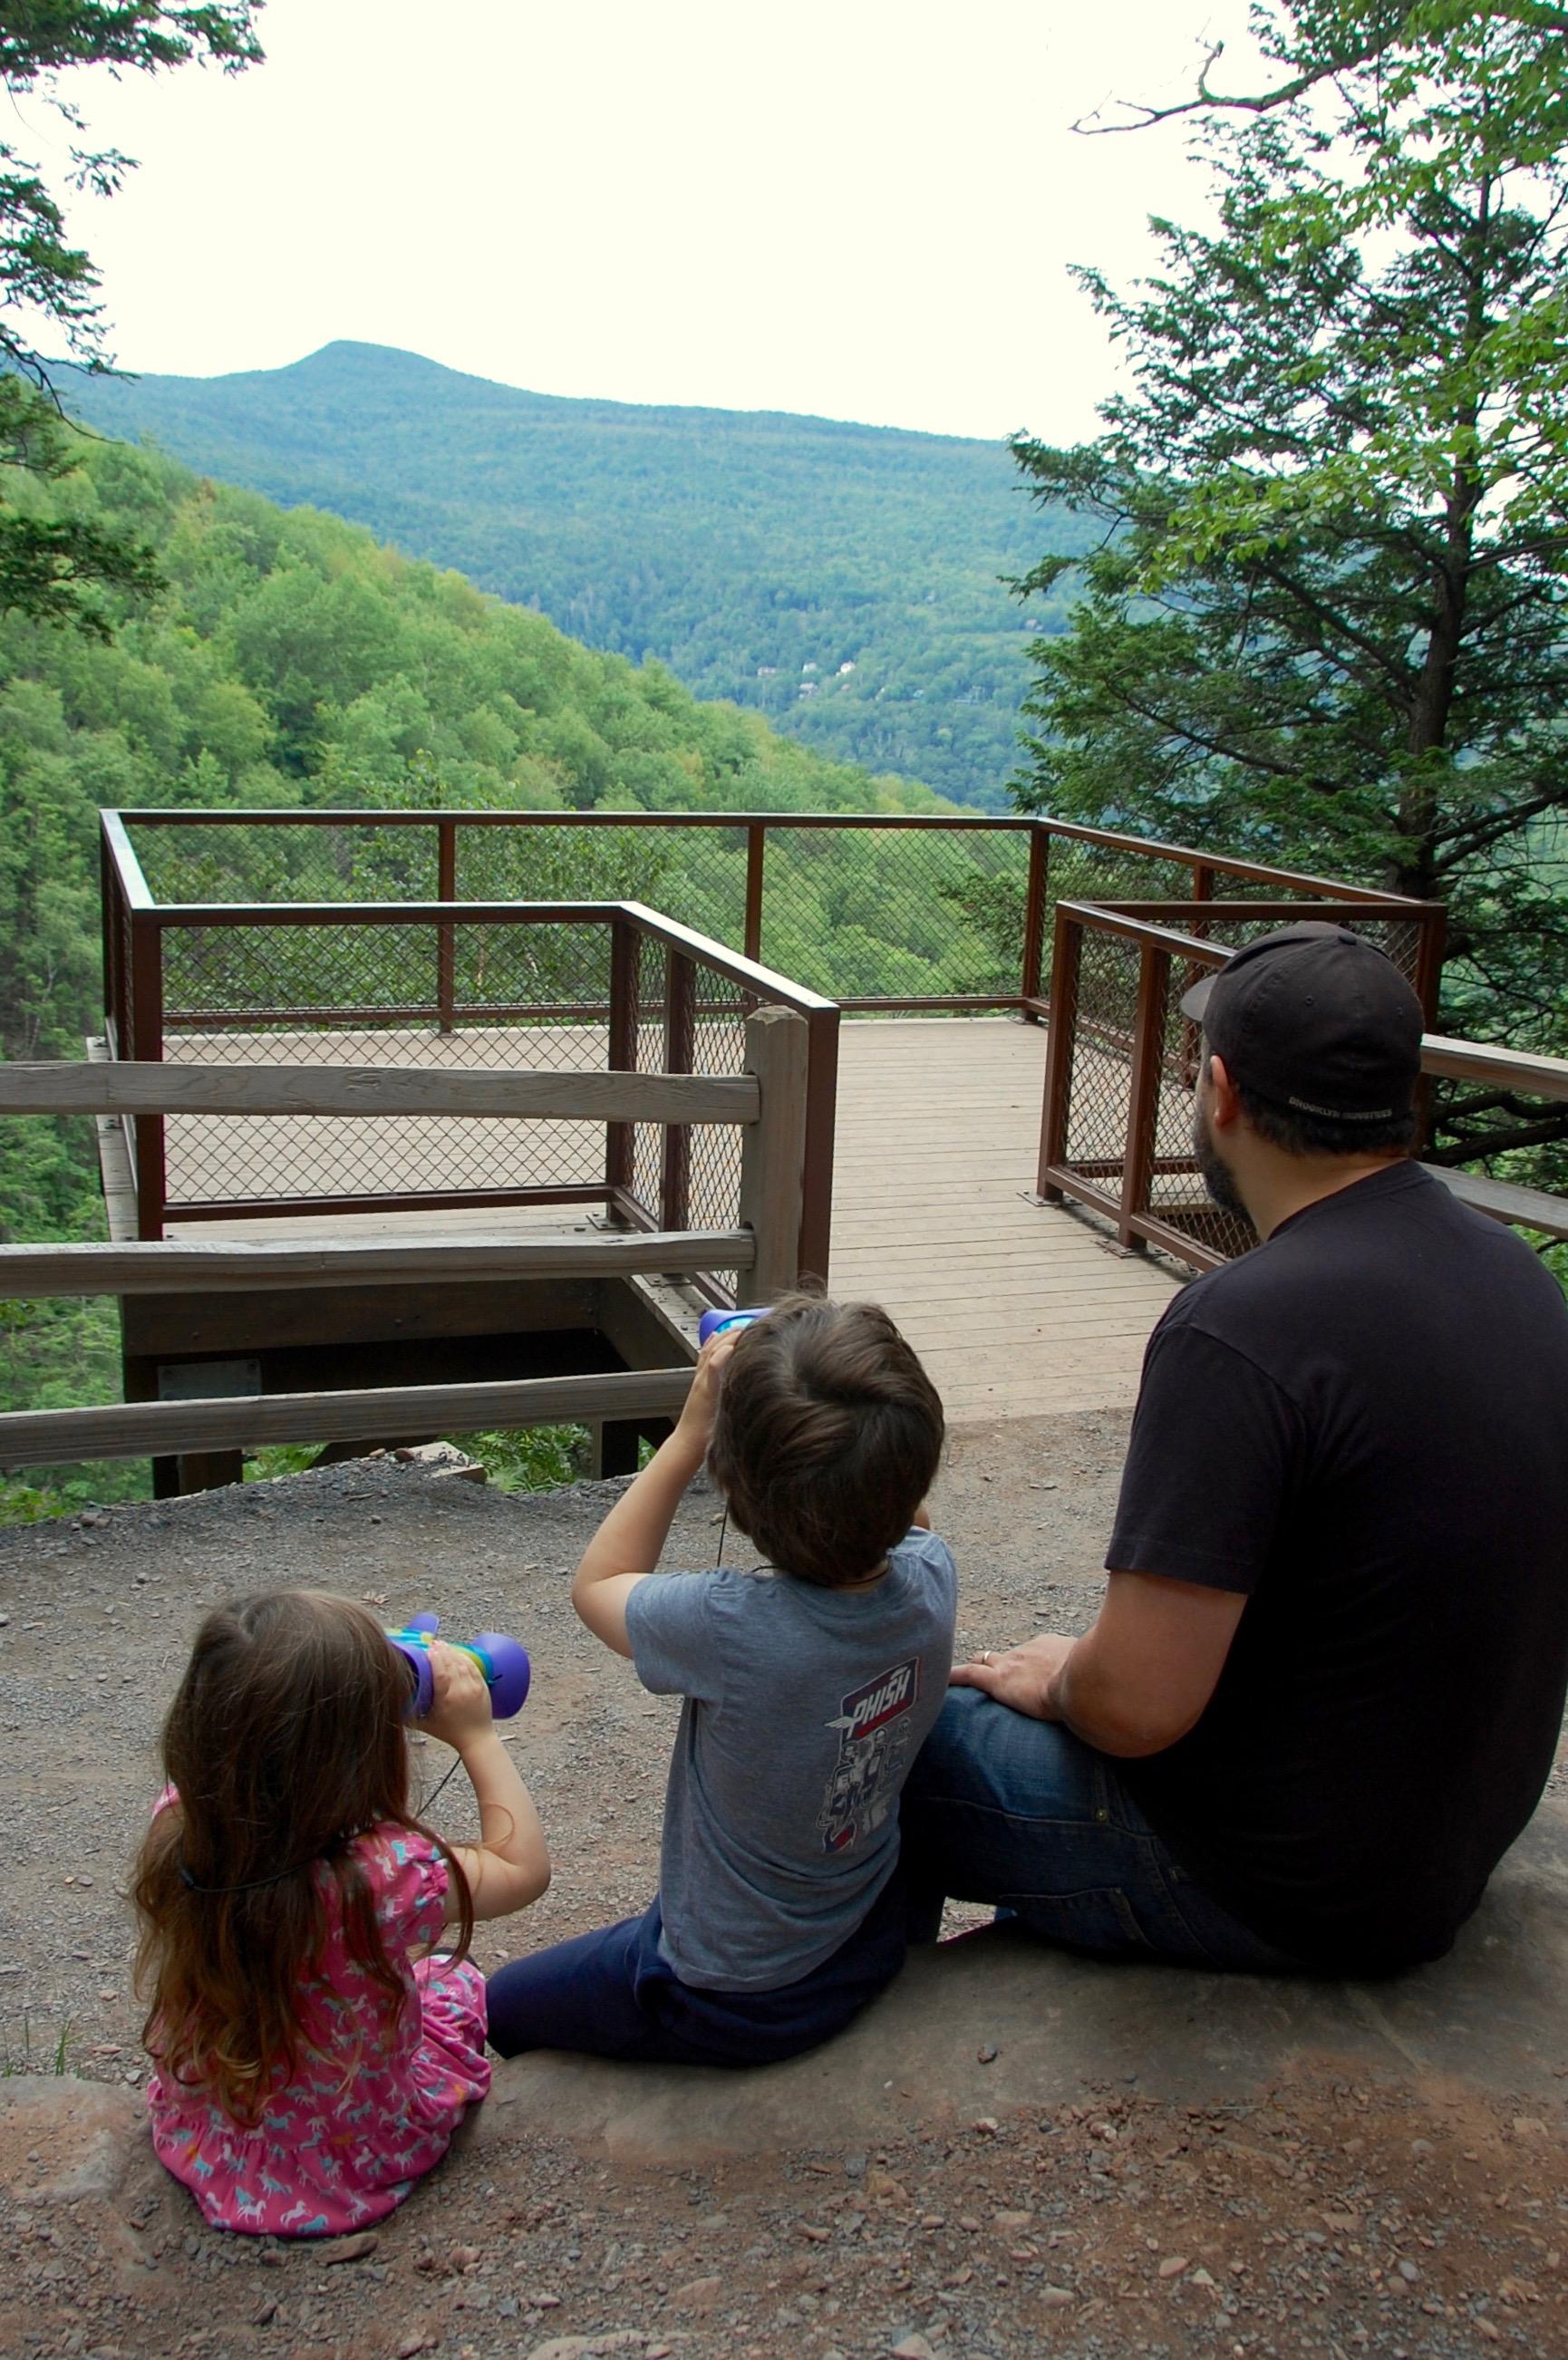 Kaaterskill Falls viewing platform